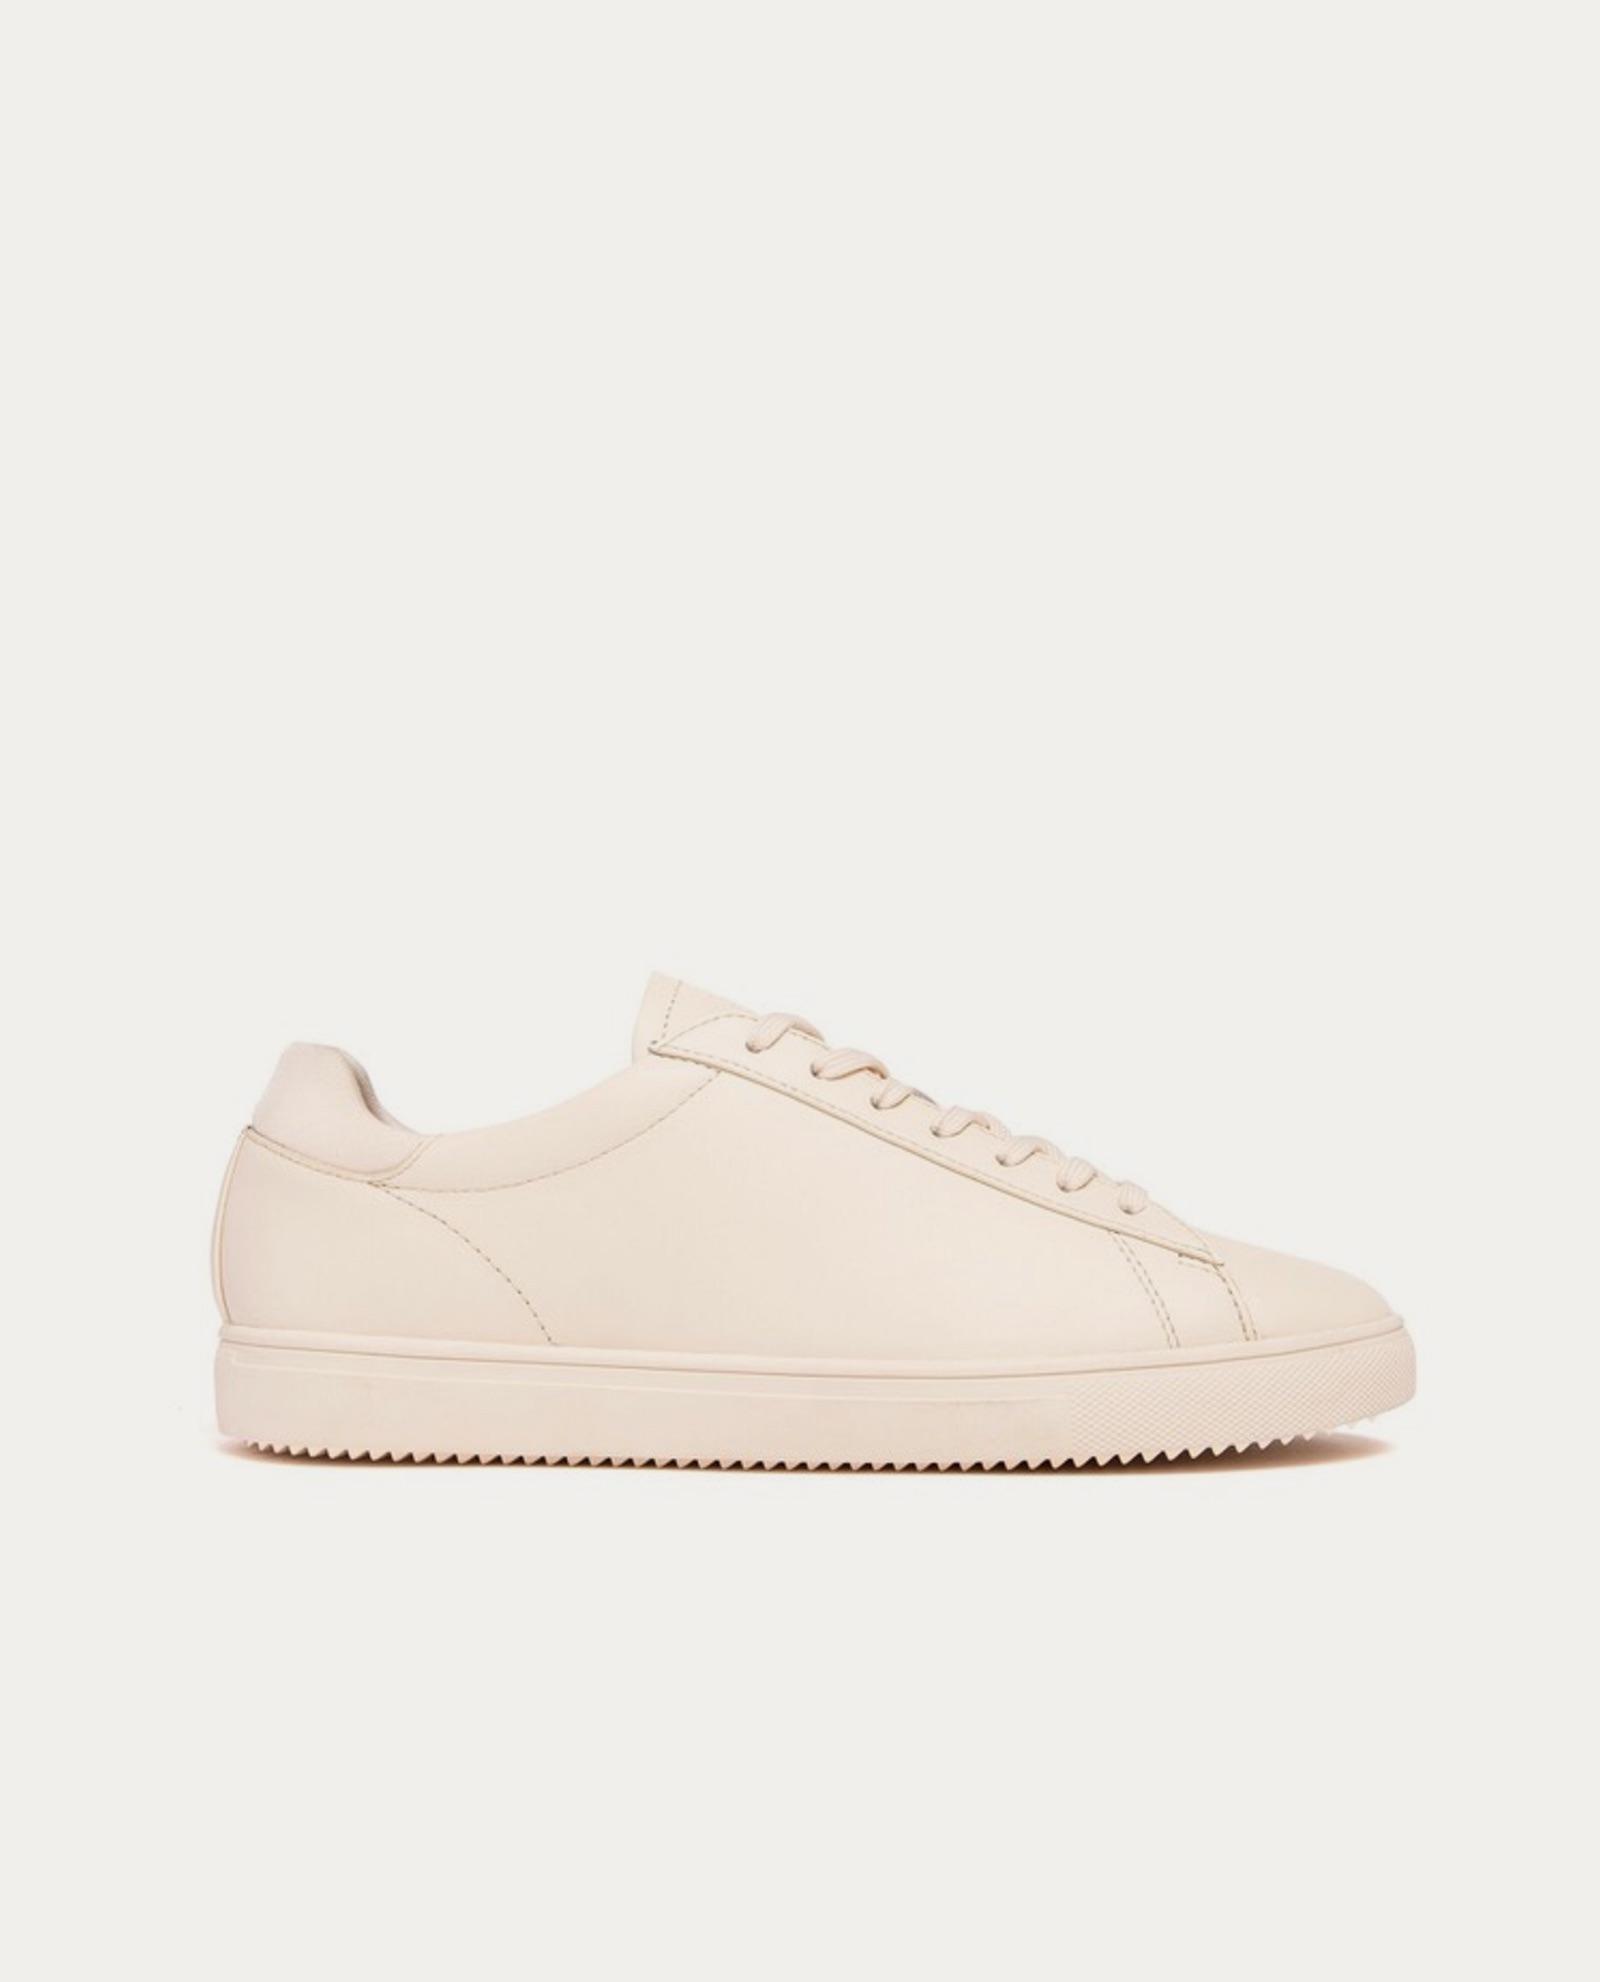 clae_chaussure_sniquers_bradley_leather_ecru_1